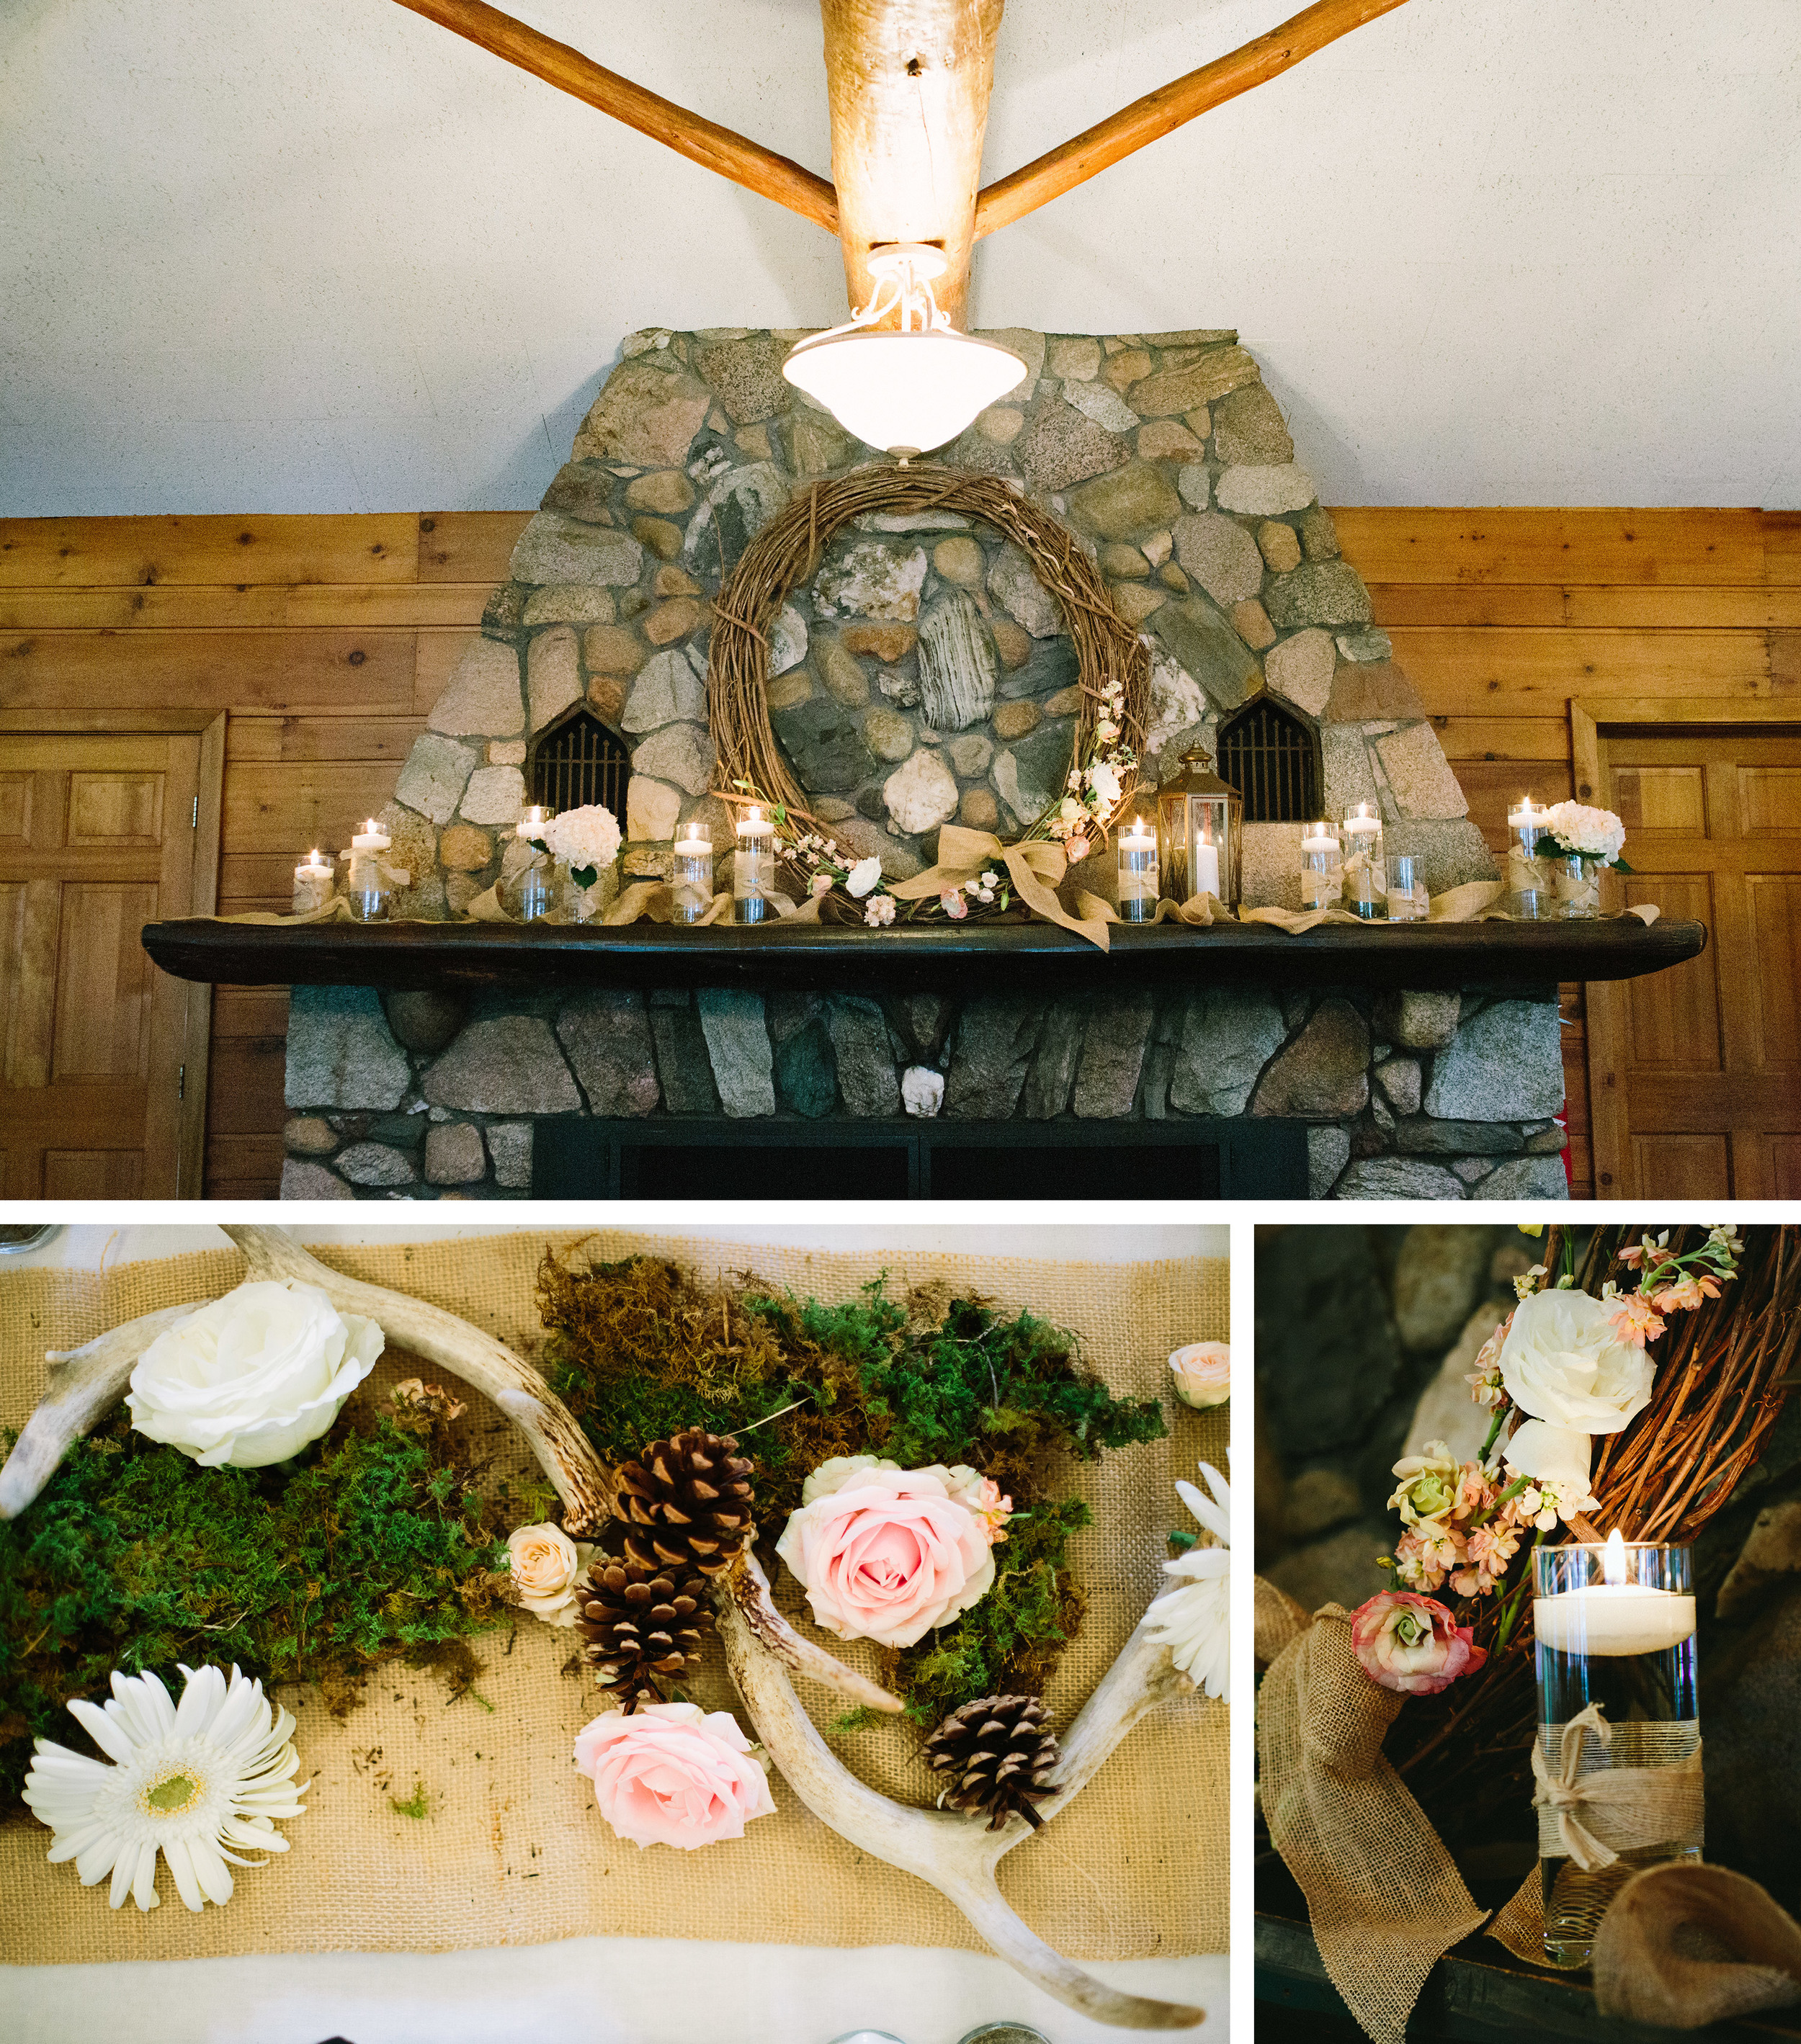 41-Maddens_Resort_Wedding_Wilson_Bay_Gull_Lake.jpg